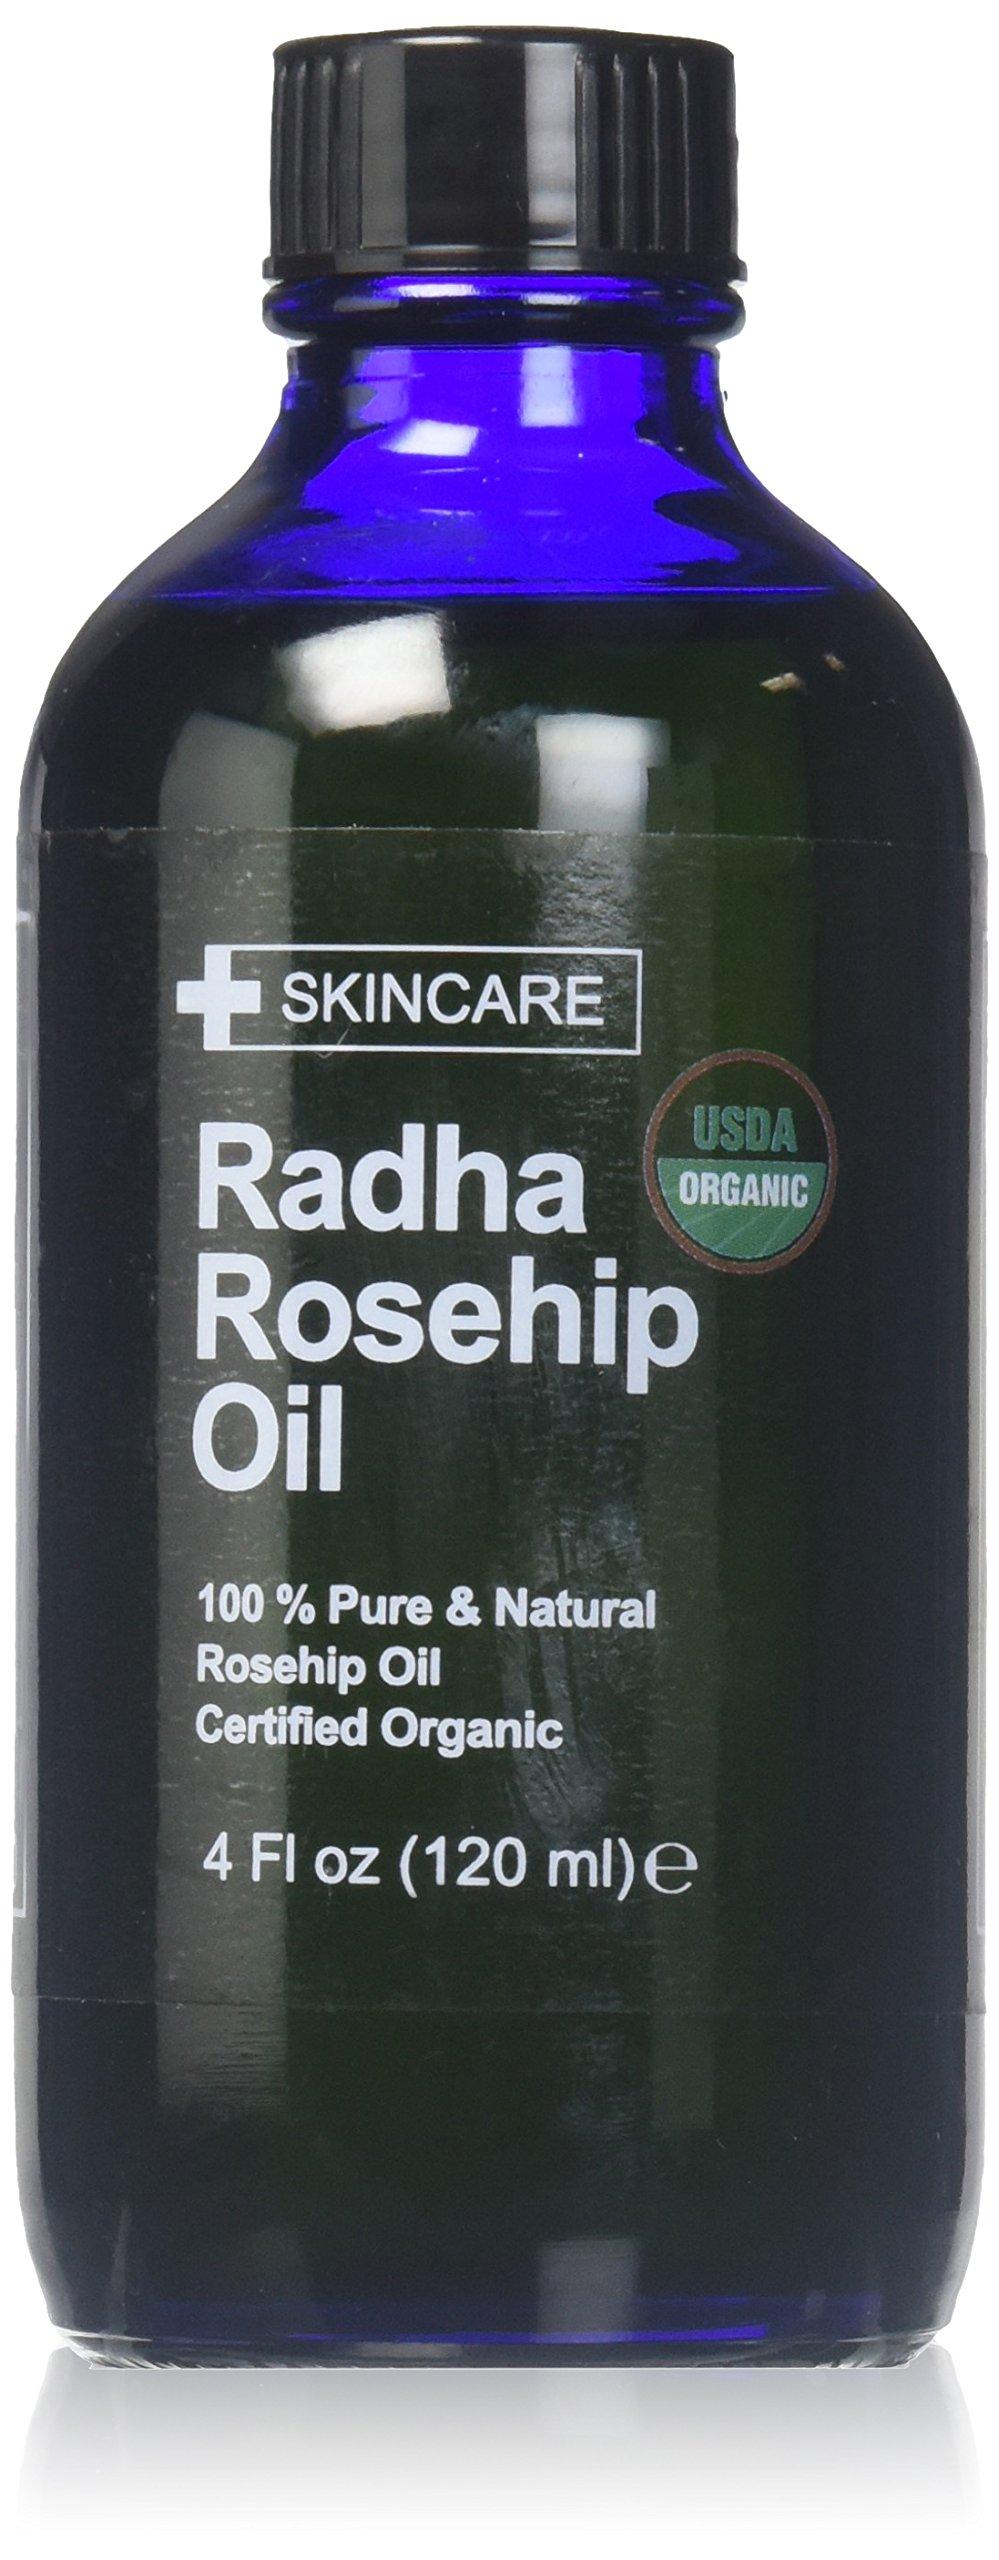 Radha Beauty USDA Certified Organic 100% Pure Oil - 4 oz. (Rosehip)